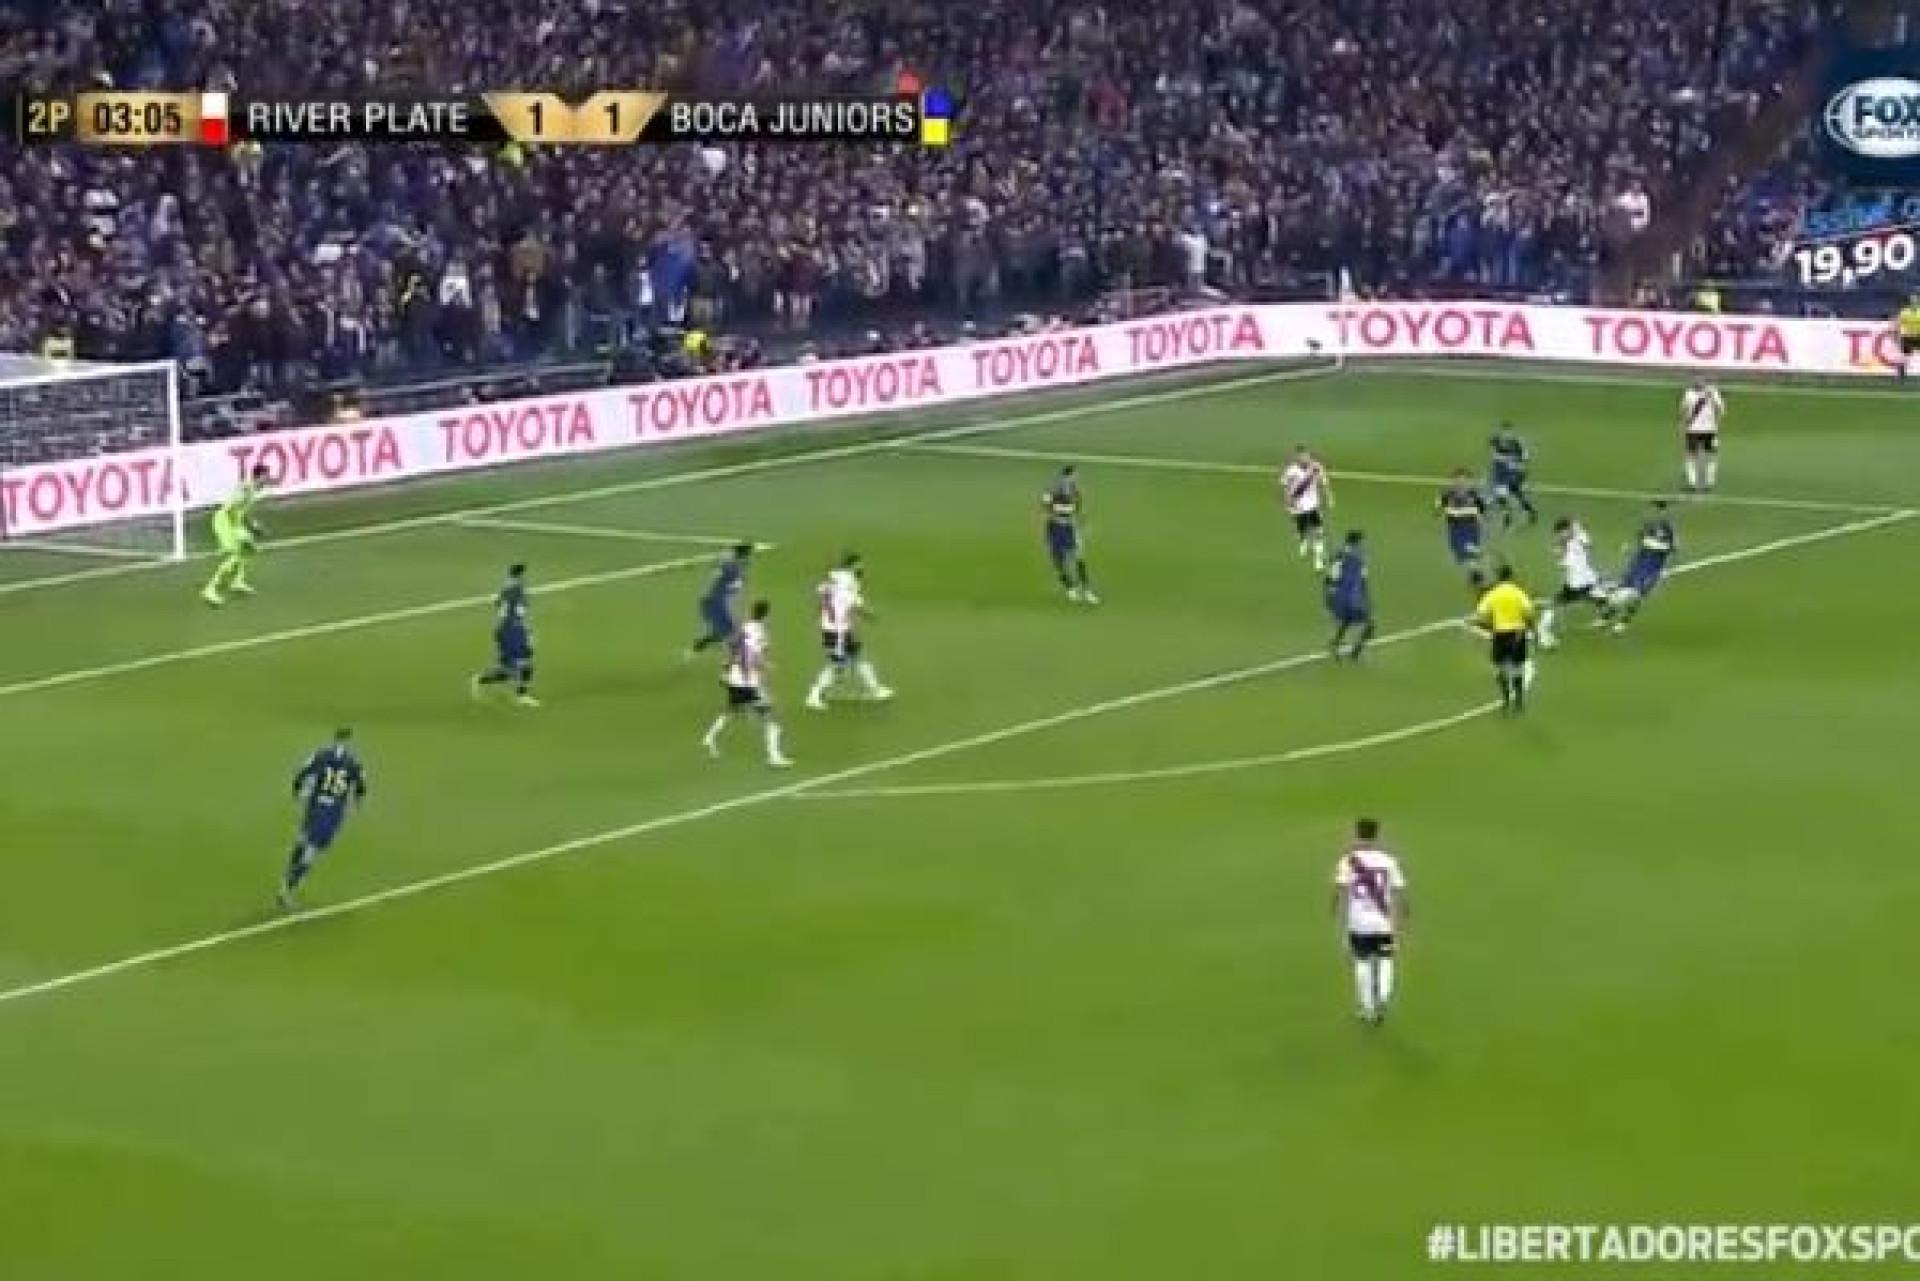 O golaço de Quintero que entregou a Libertadores ao River Plate